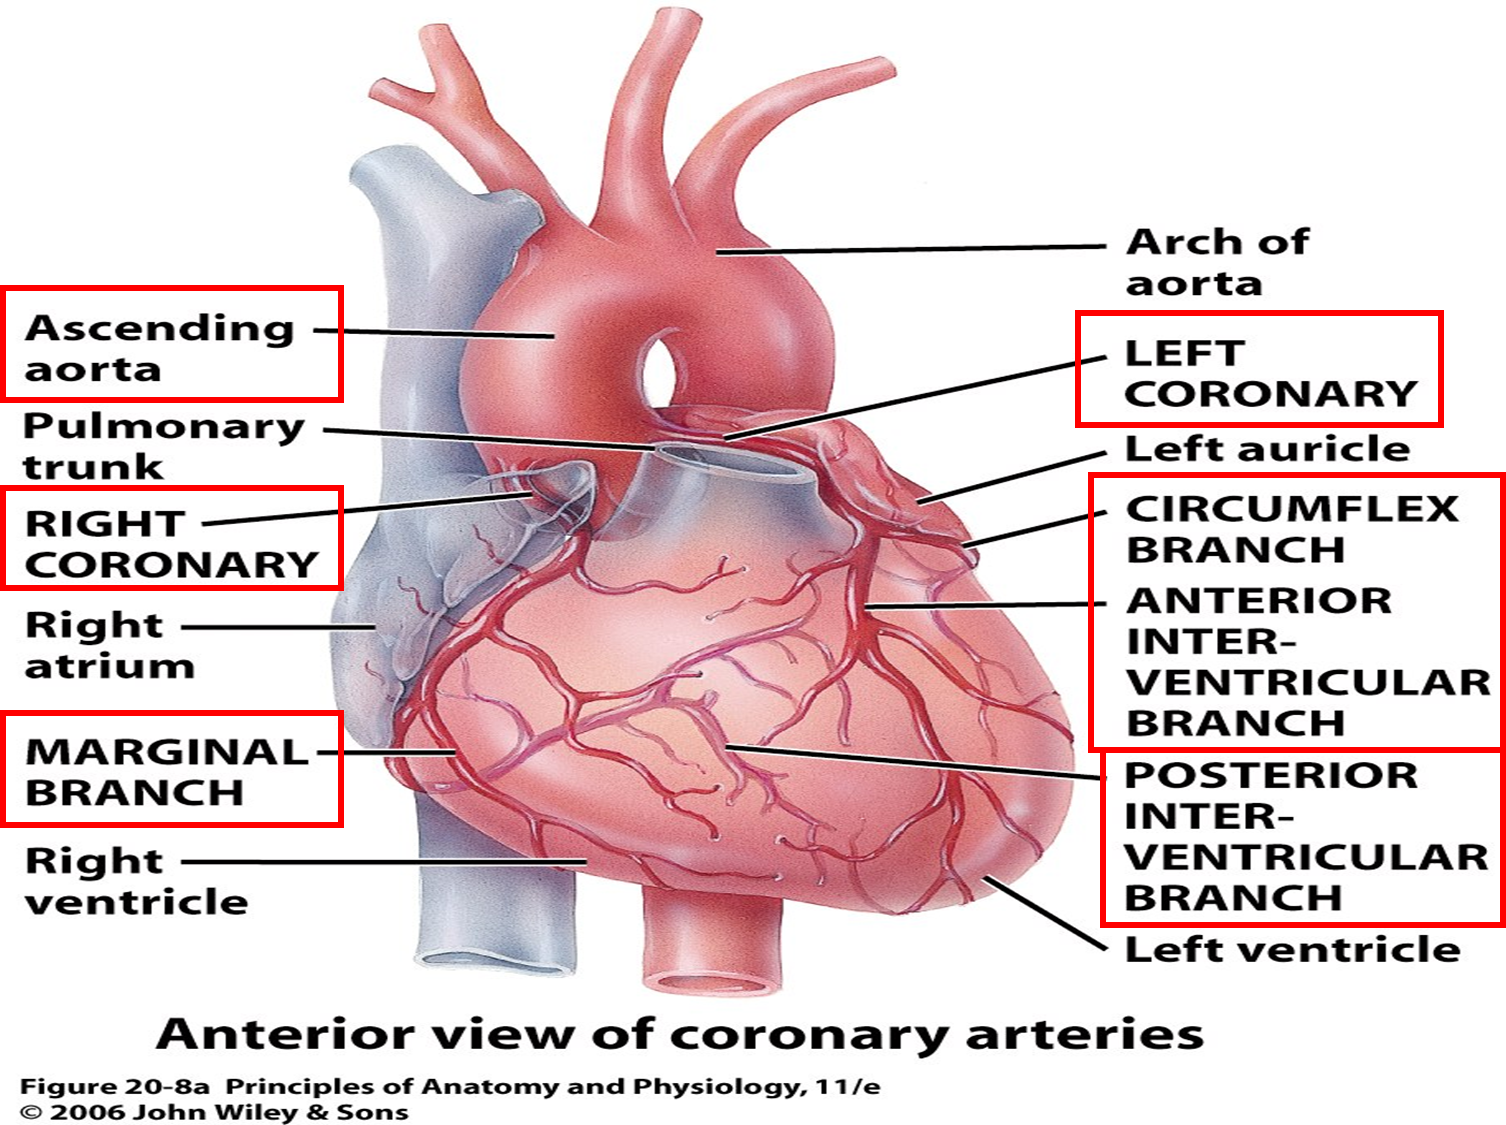 Studyblue.com Anatomy & Physiology | Medical billing, insurance ...